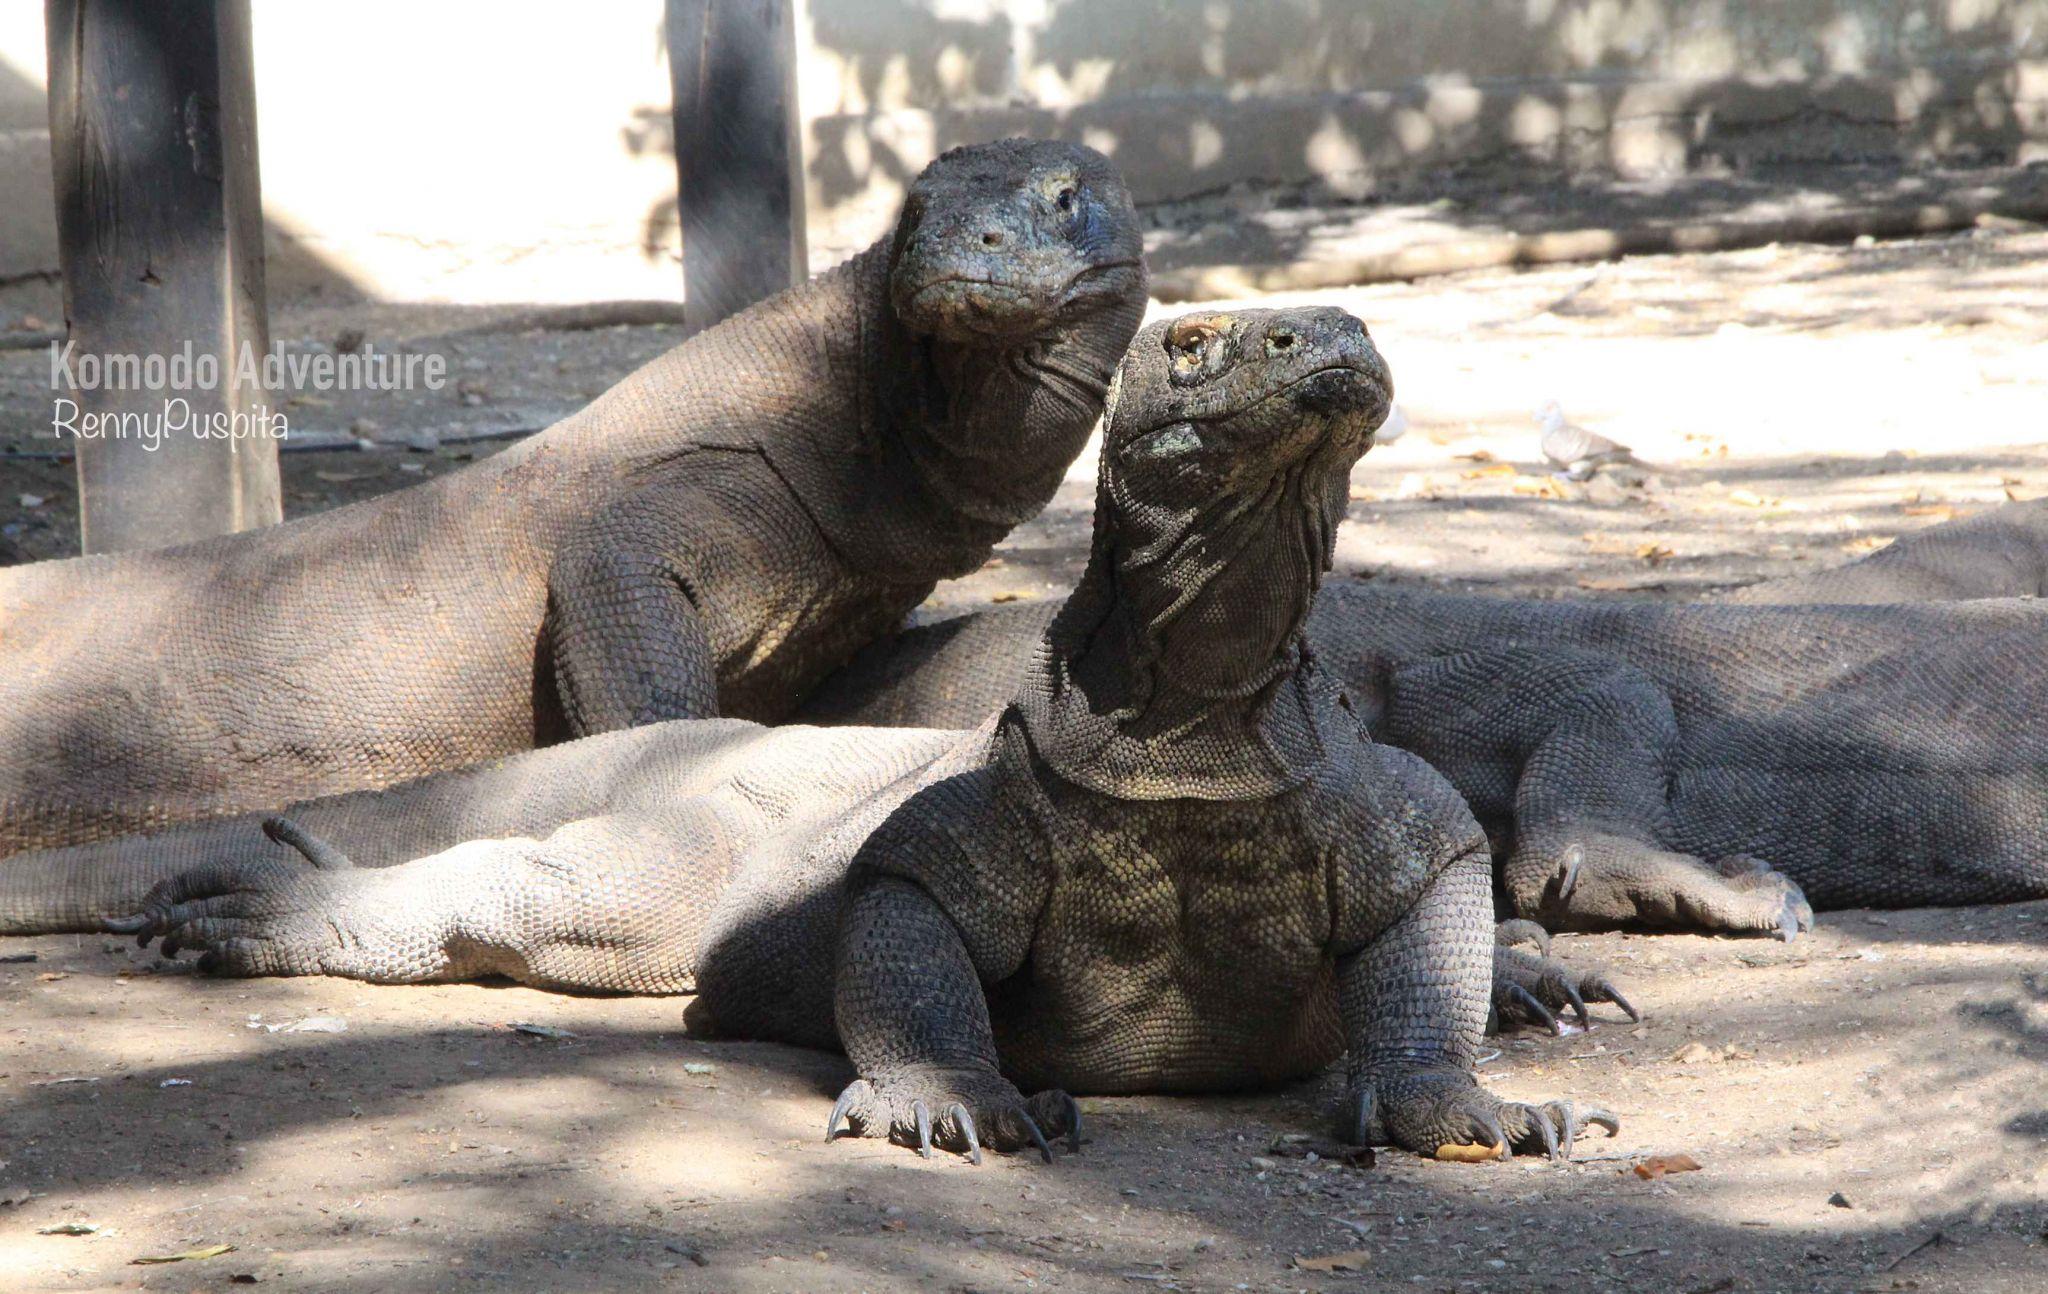 Komodo Island, Jurasic Park from Indonesia, Indonesia